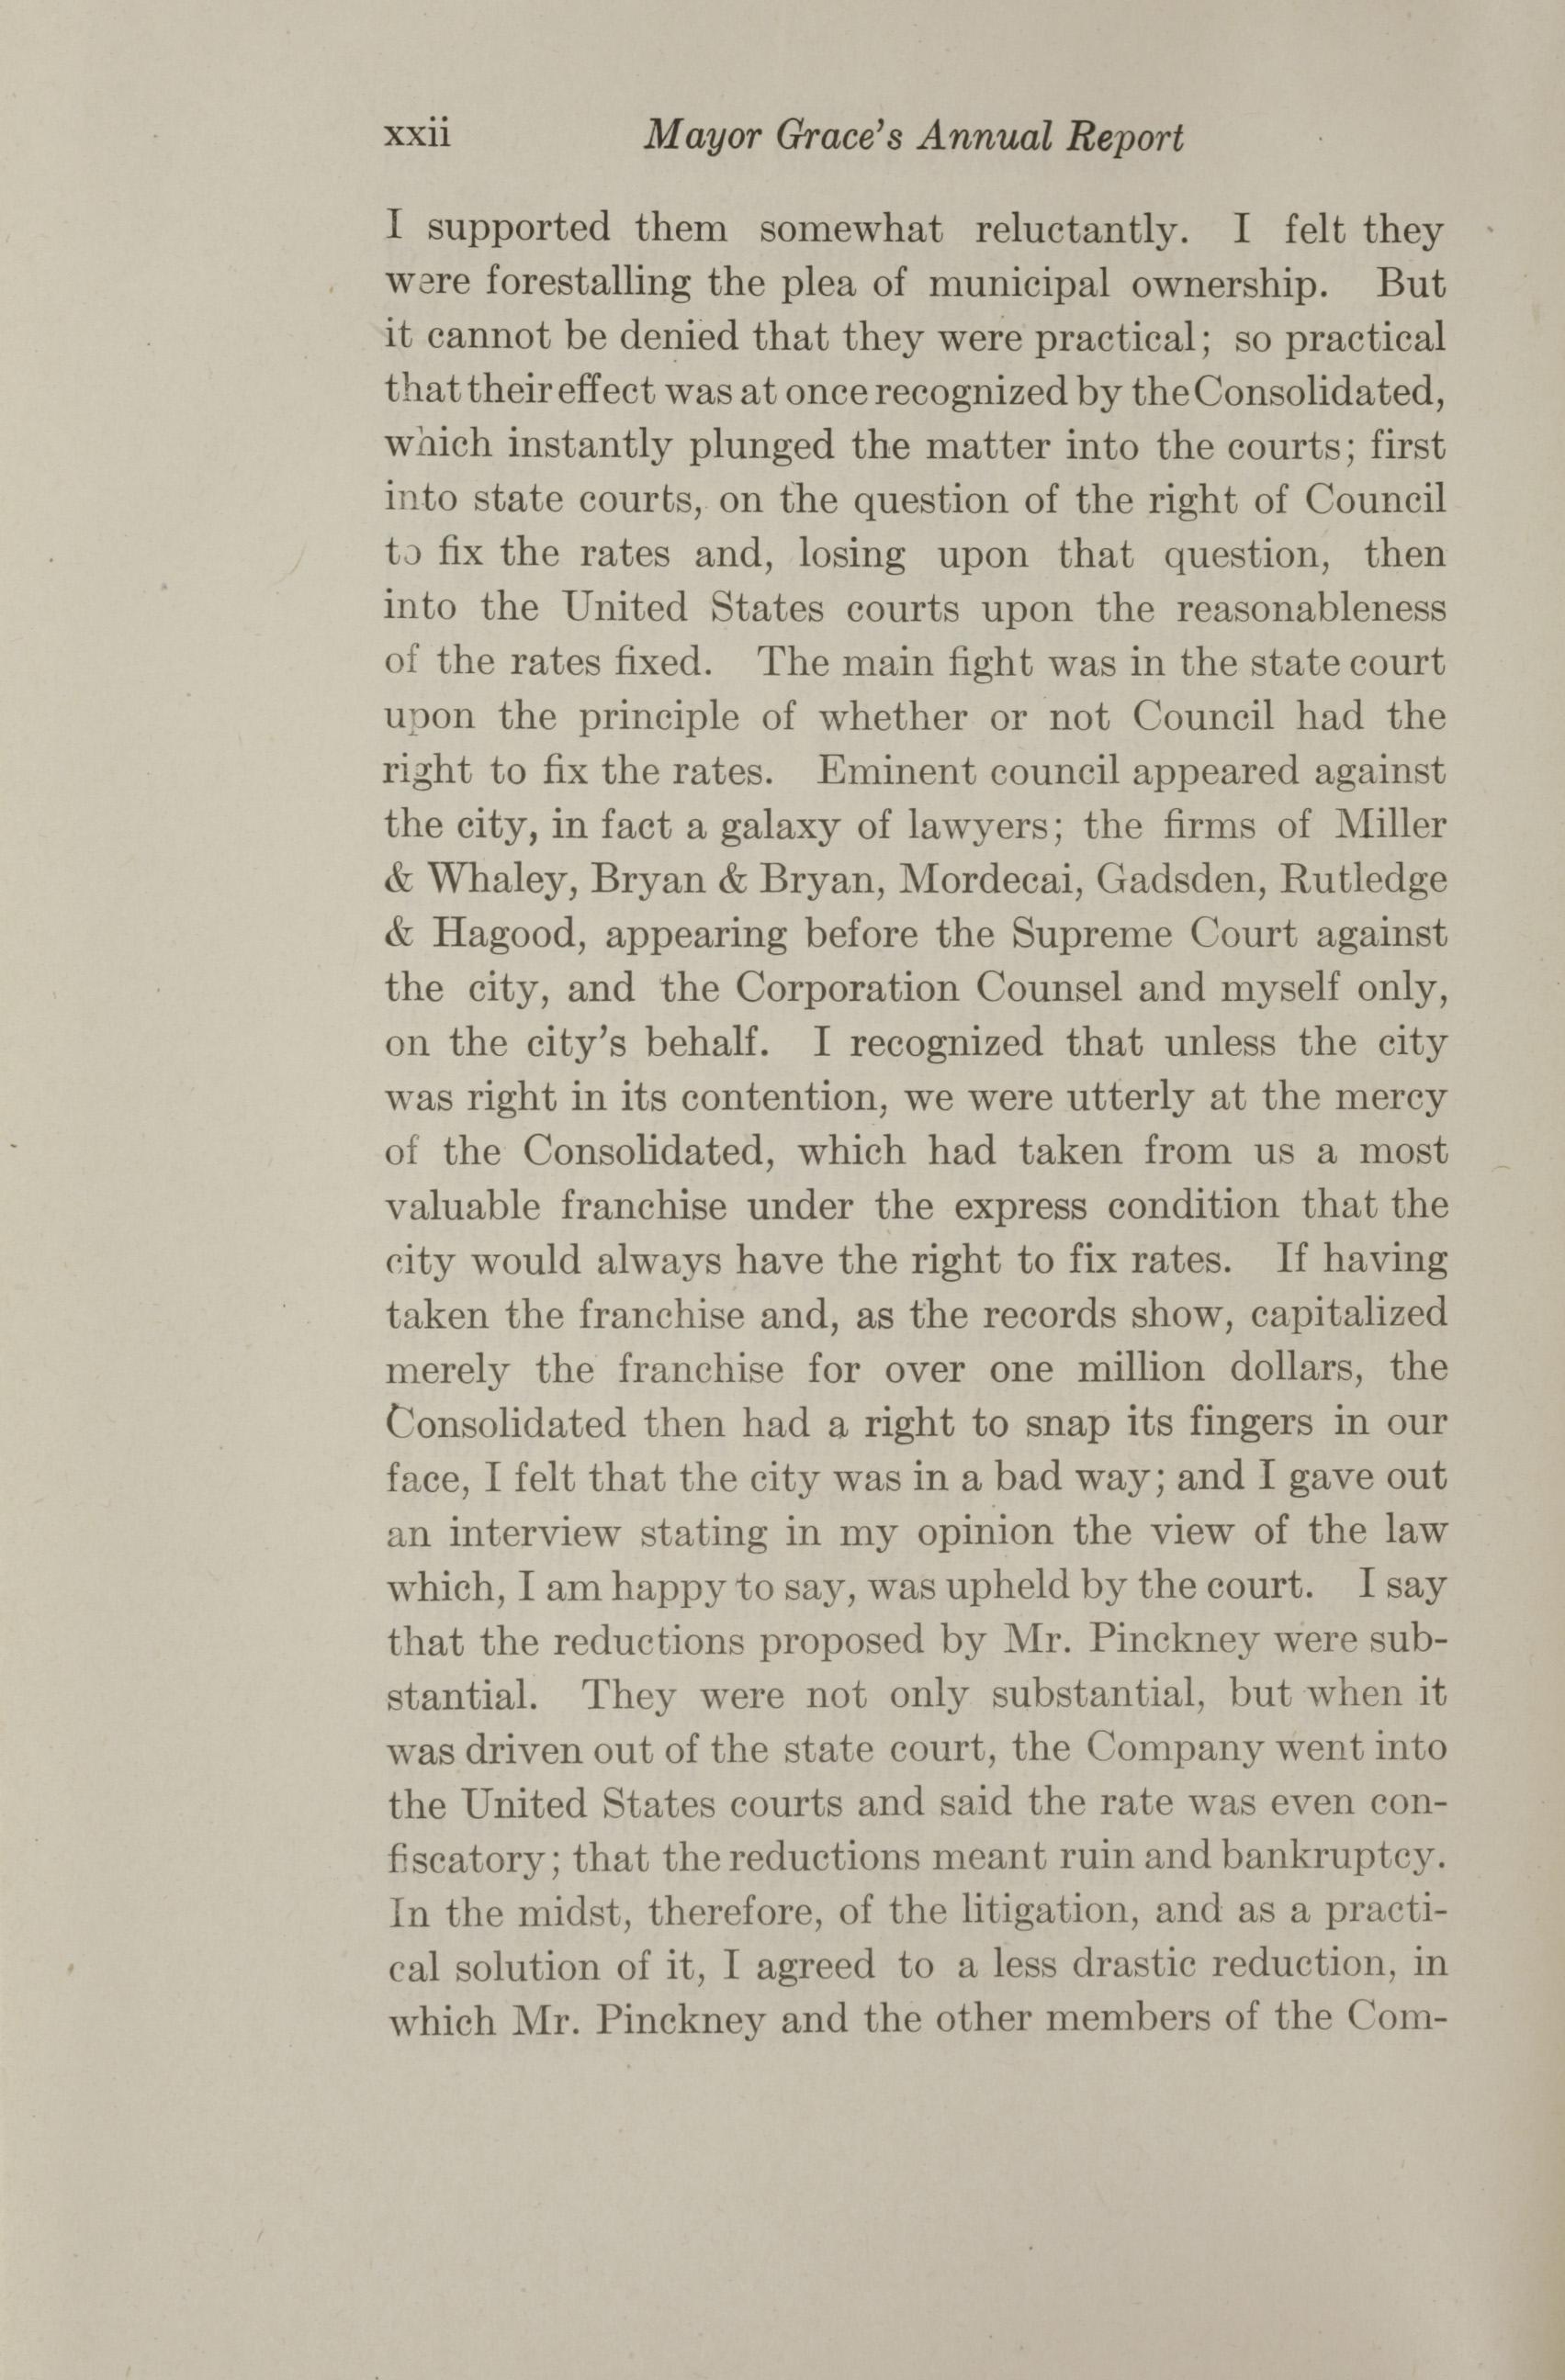 Charleston Yearbook, 1912, page xxii